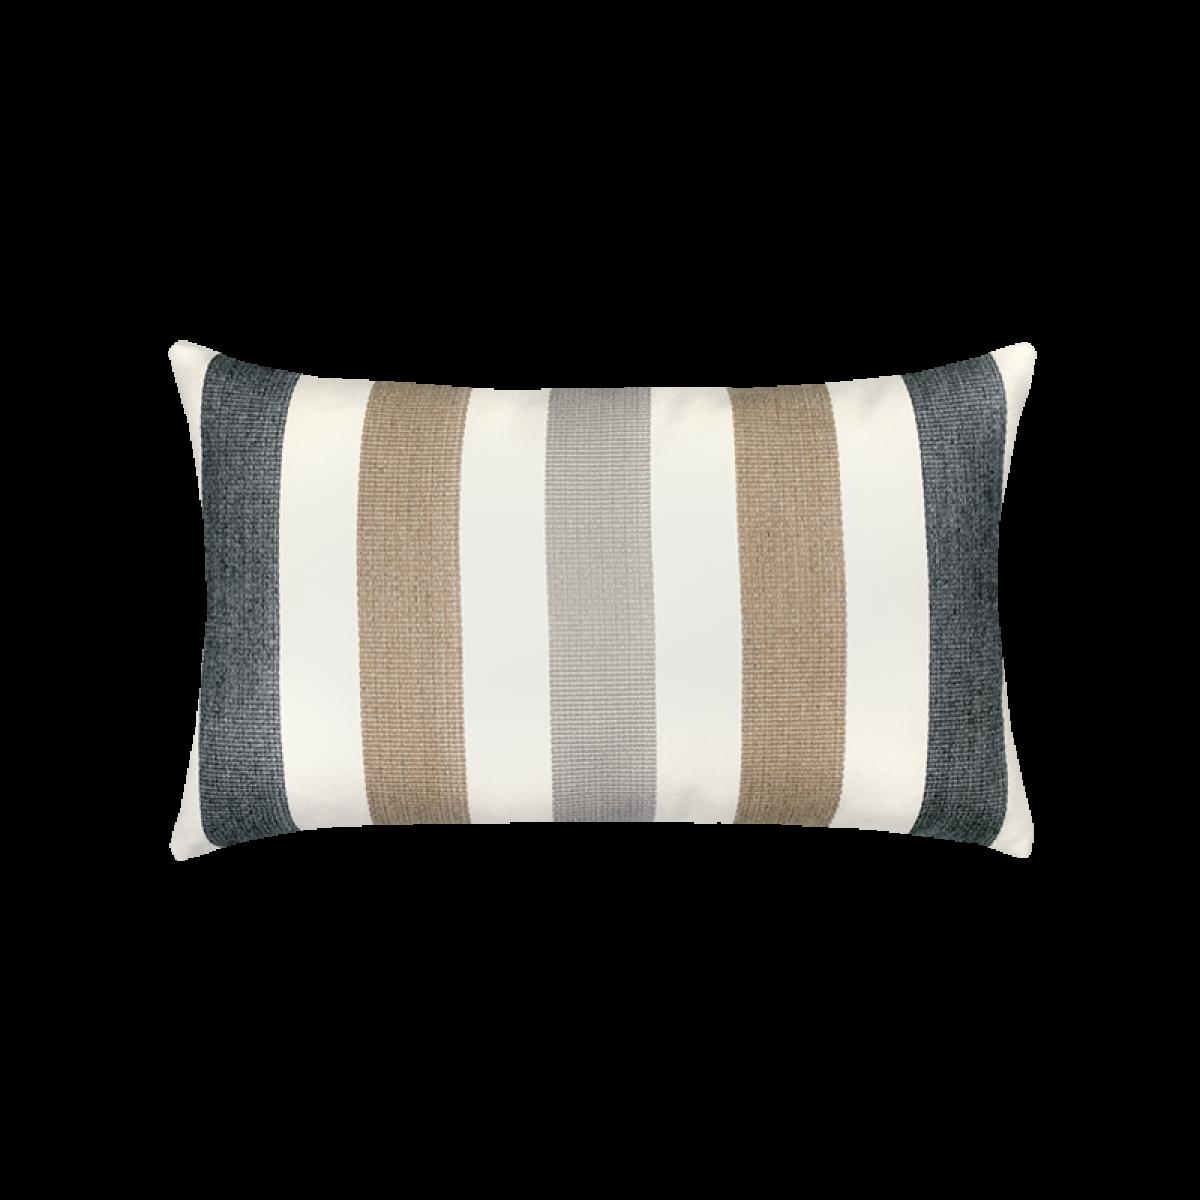 Dune Stripe Lumbar - This item will ship by 5/28